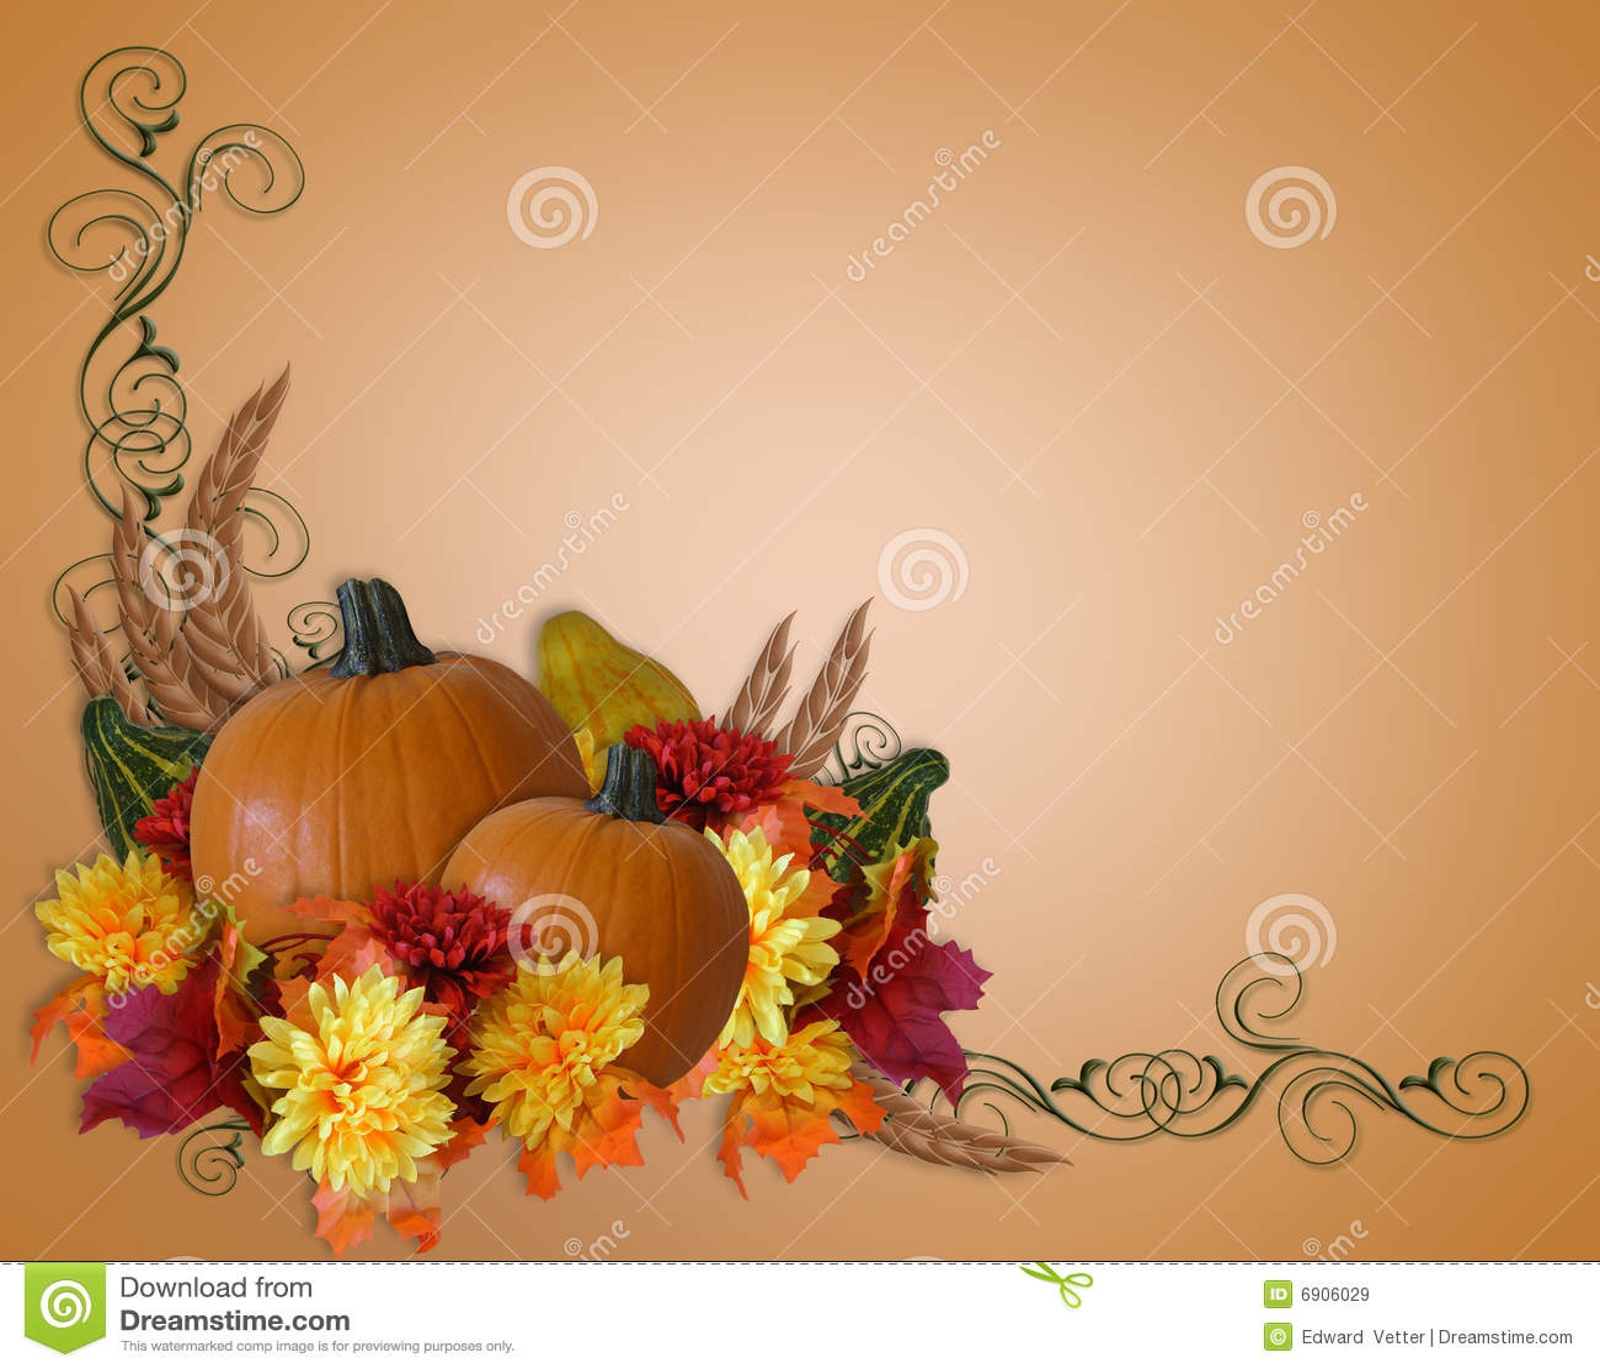 Free Fall Mums Wallpaper Thanksgiving Autumn Fall Background Stock Illustration